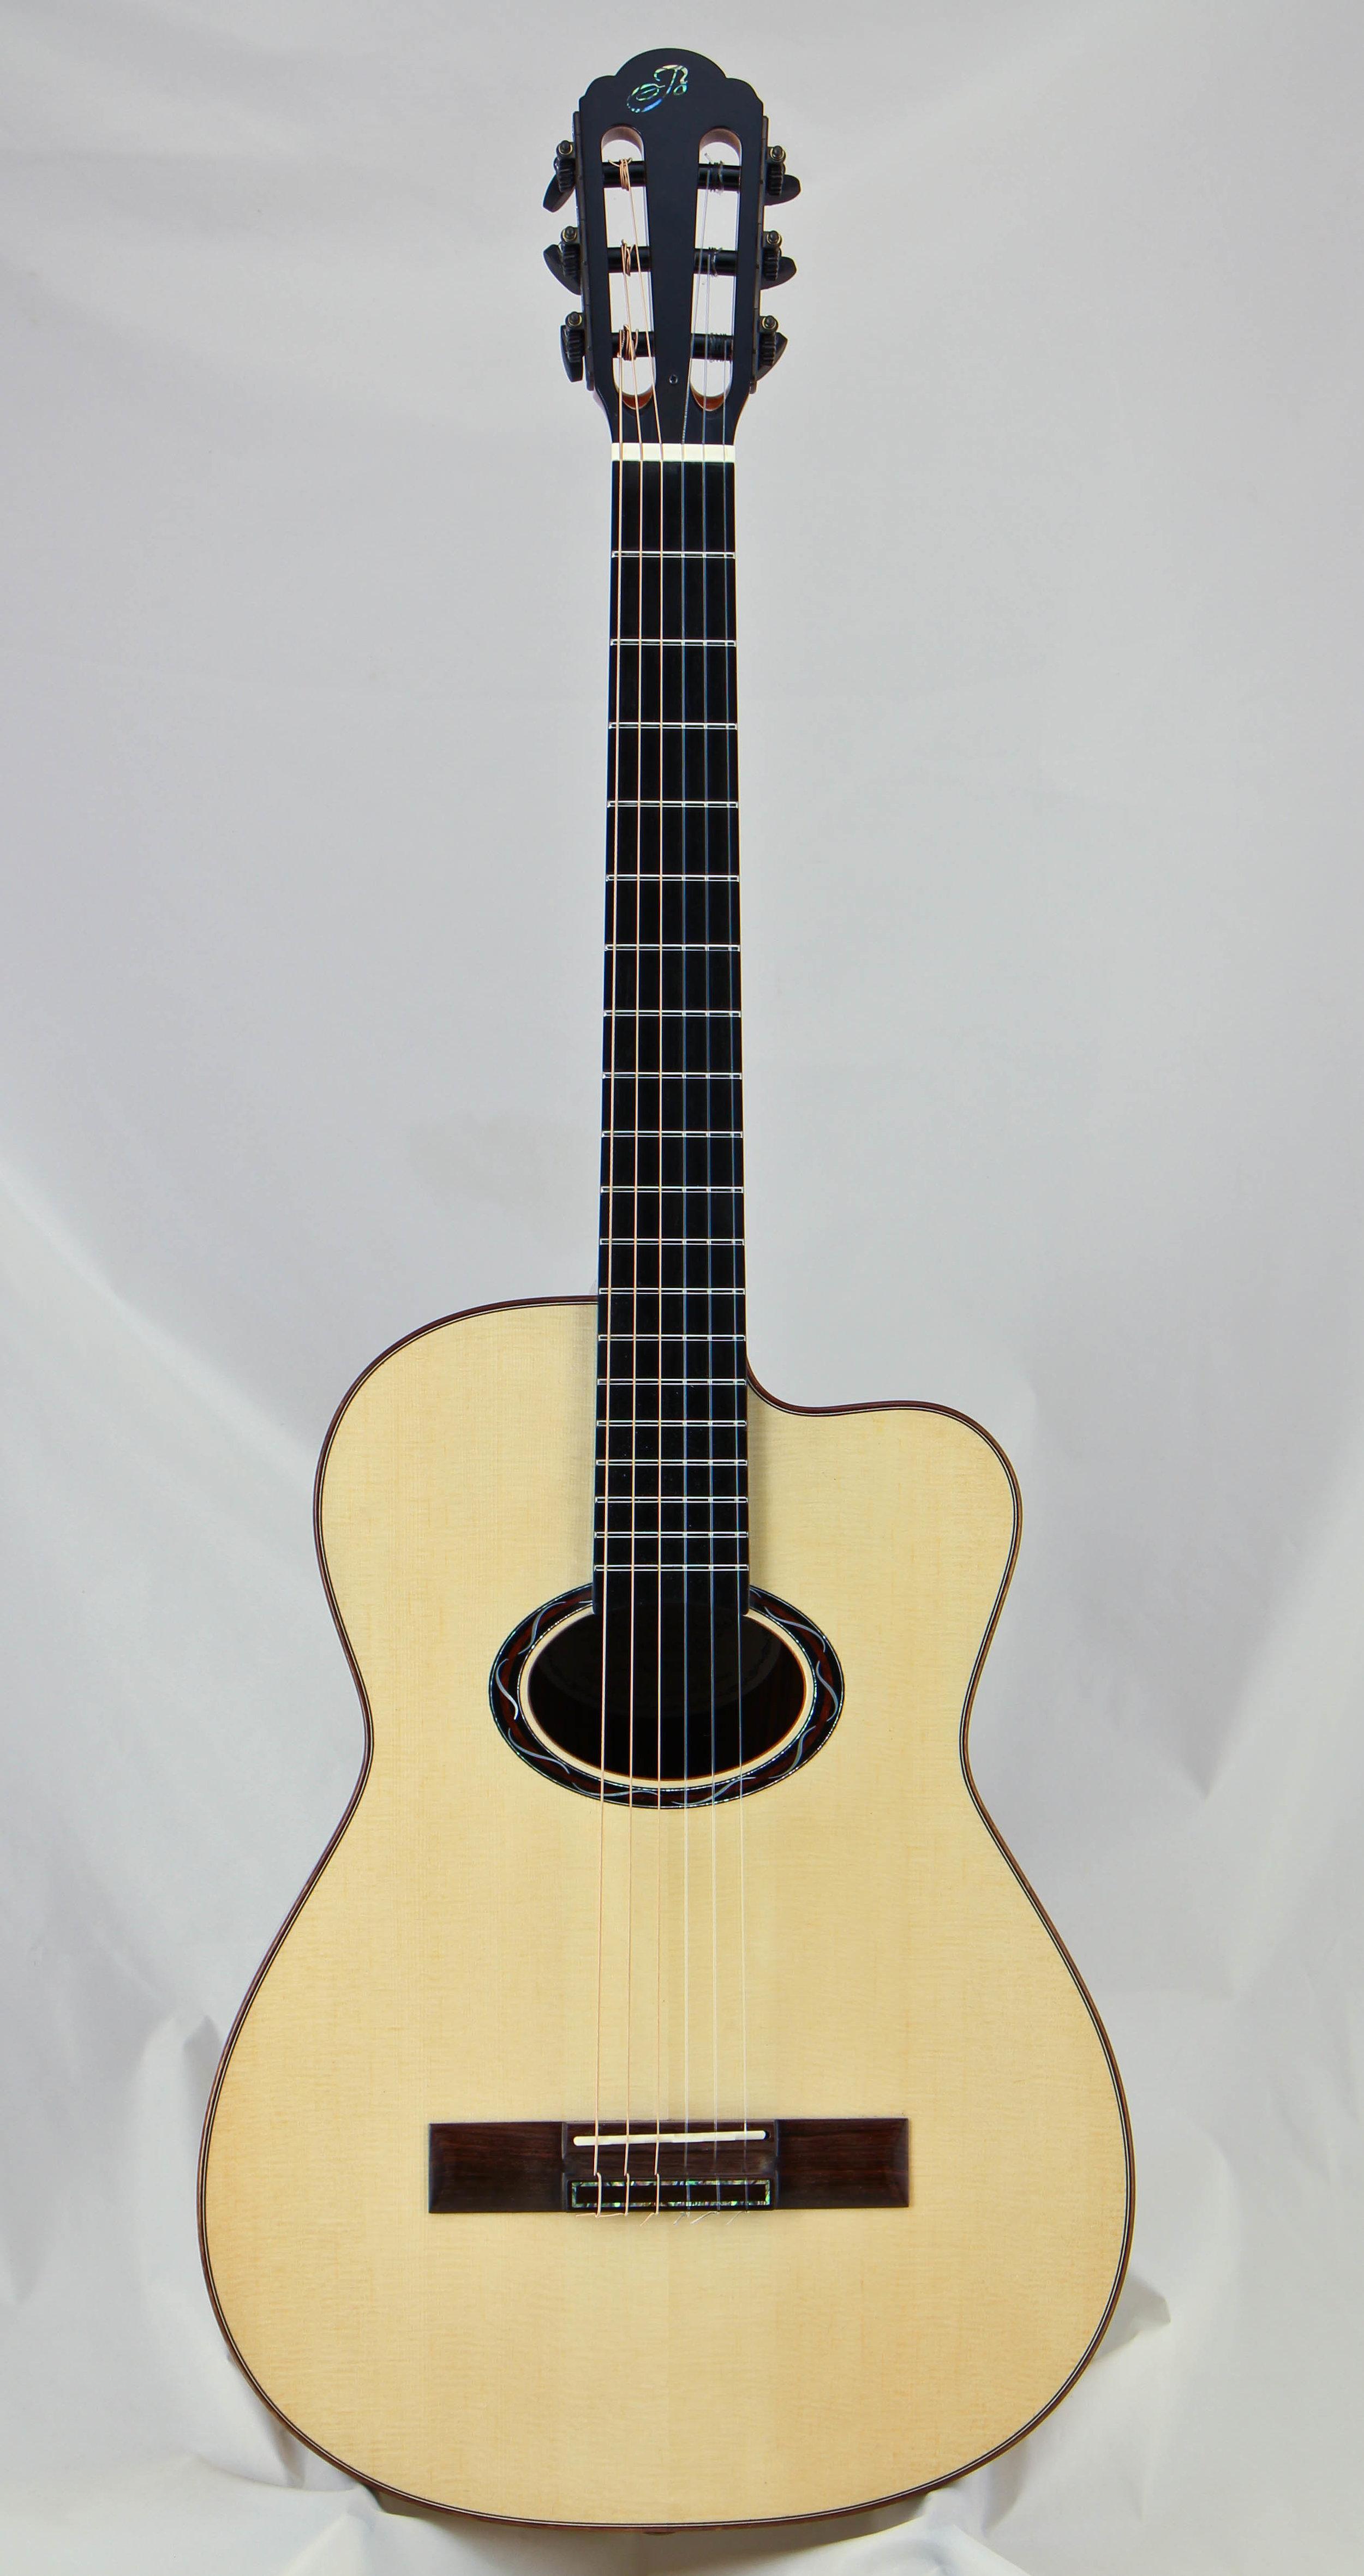 rosewoodcab-1.JPG